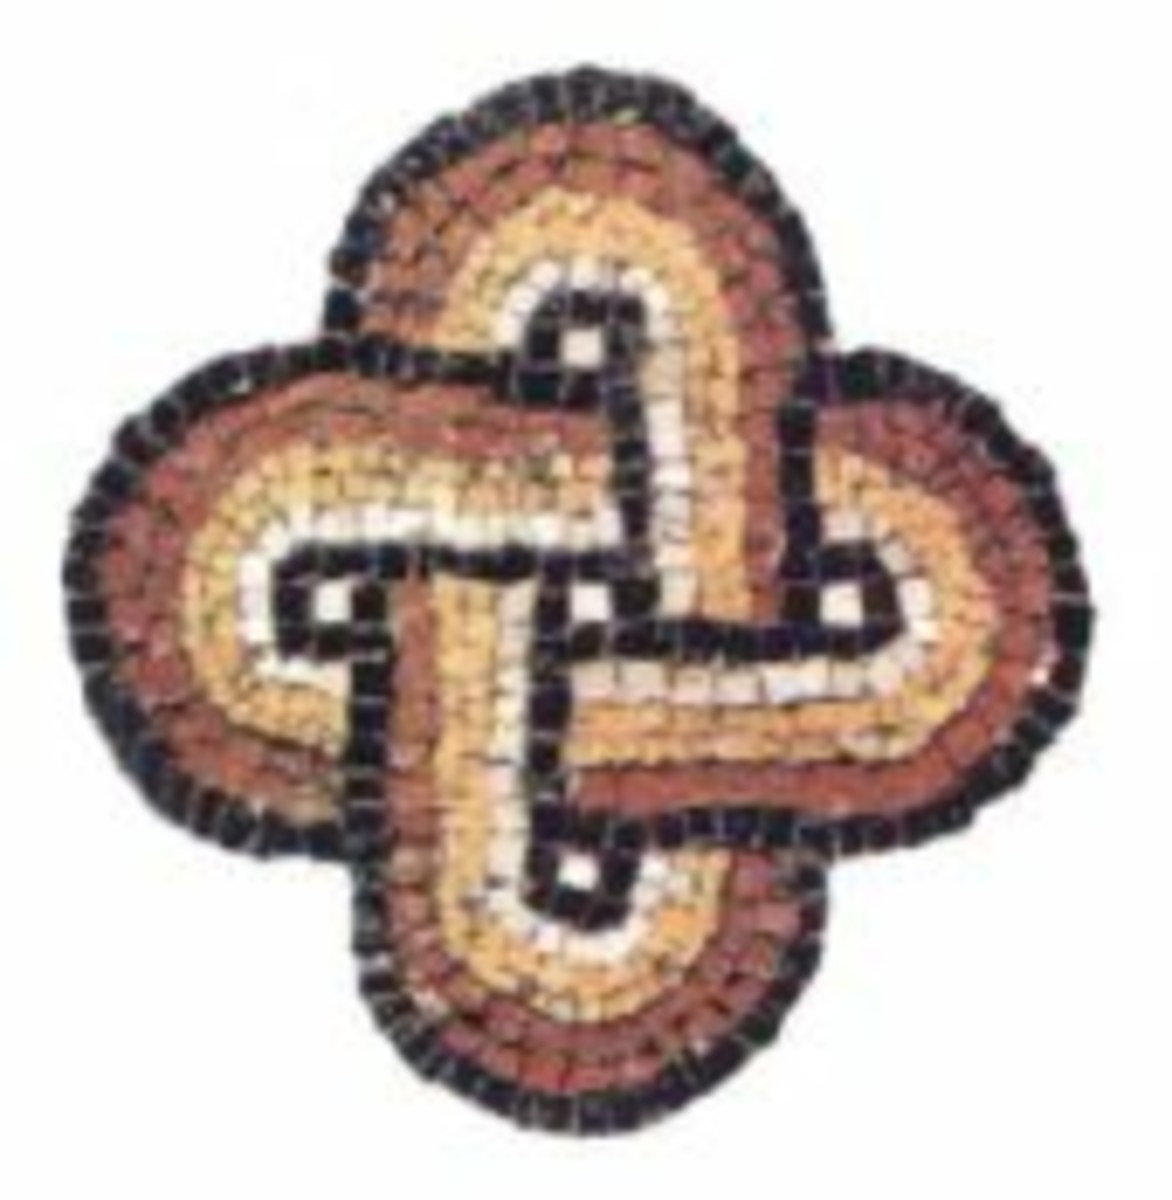 the Greco-Roman symbol for co-operation